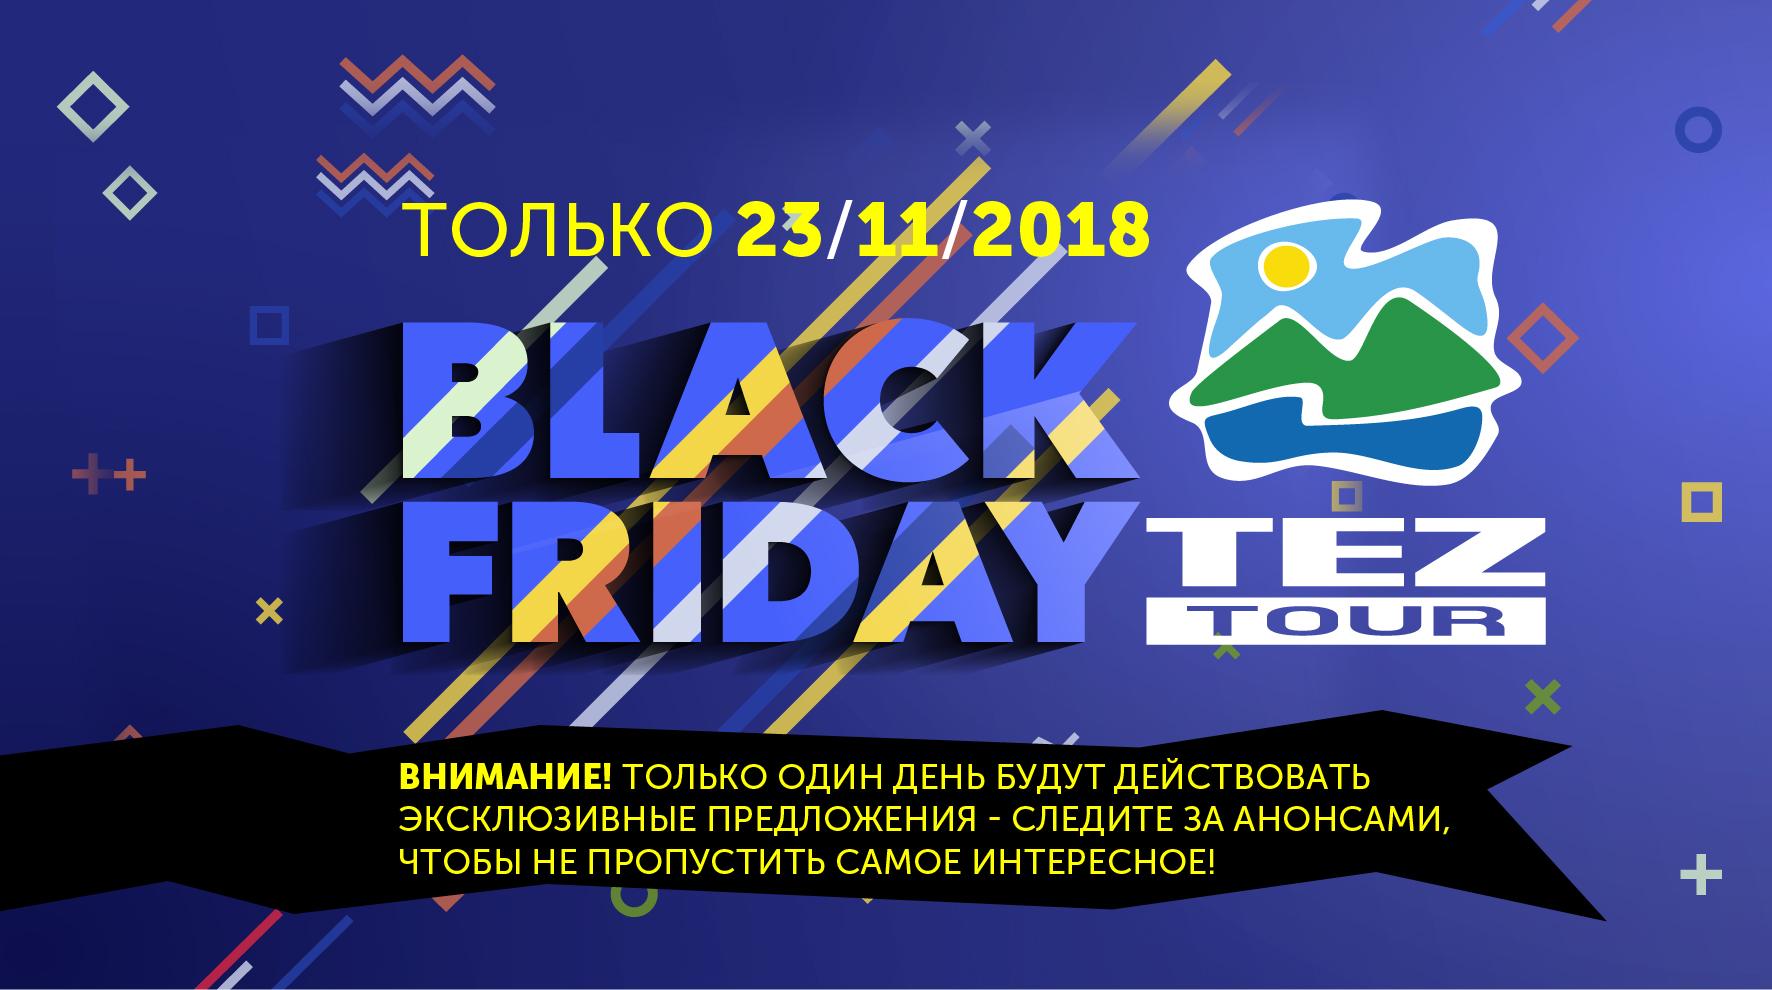 blackfridayteztour